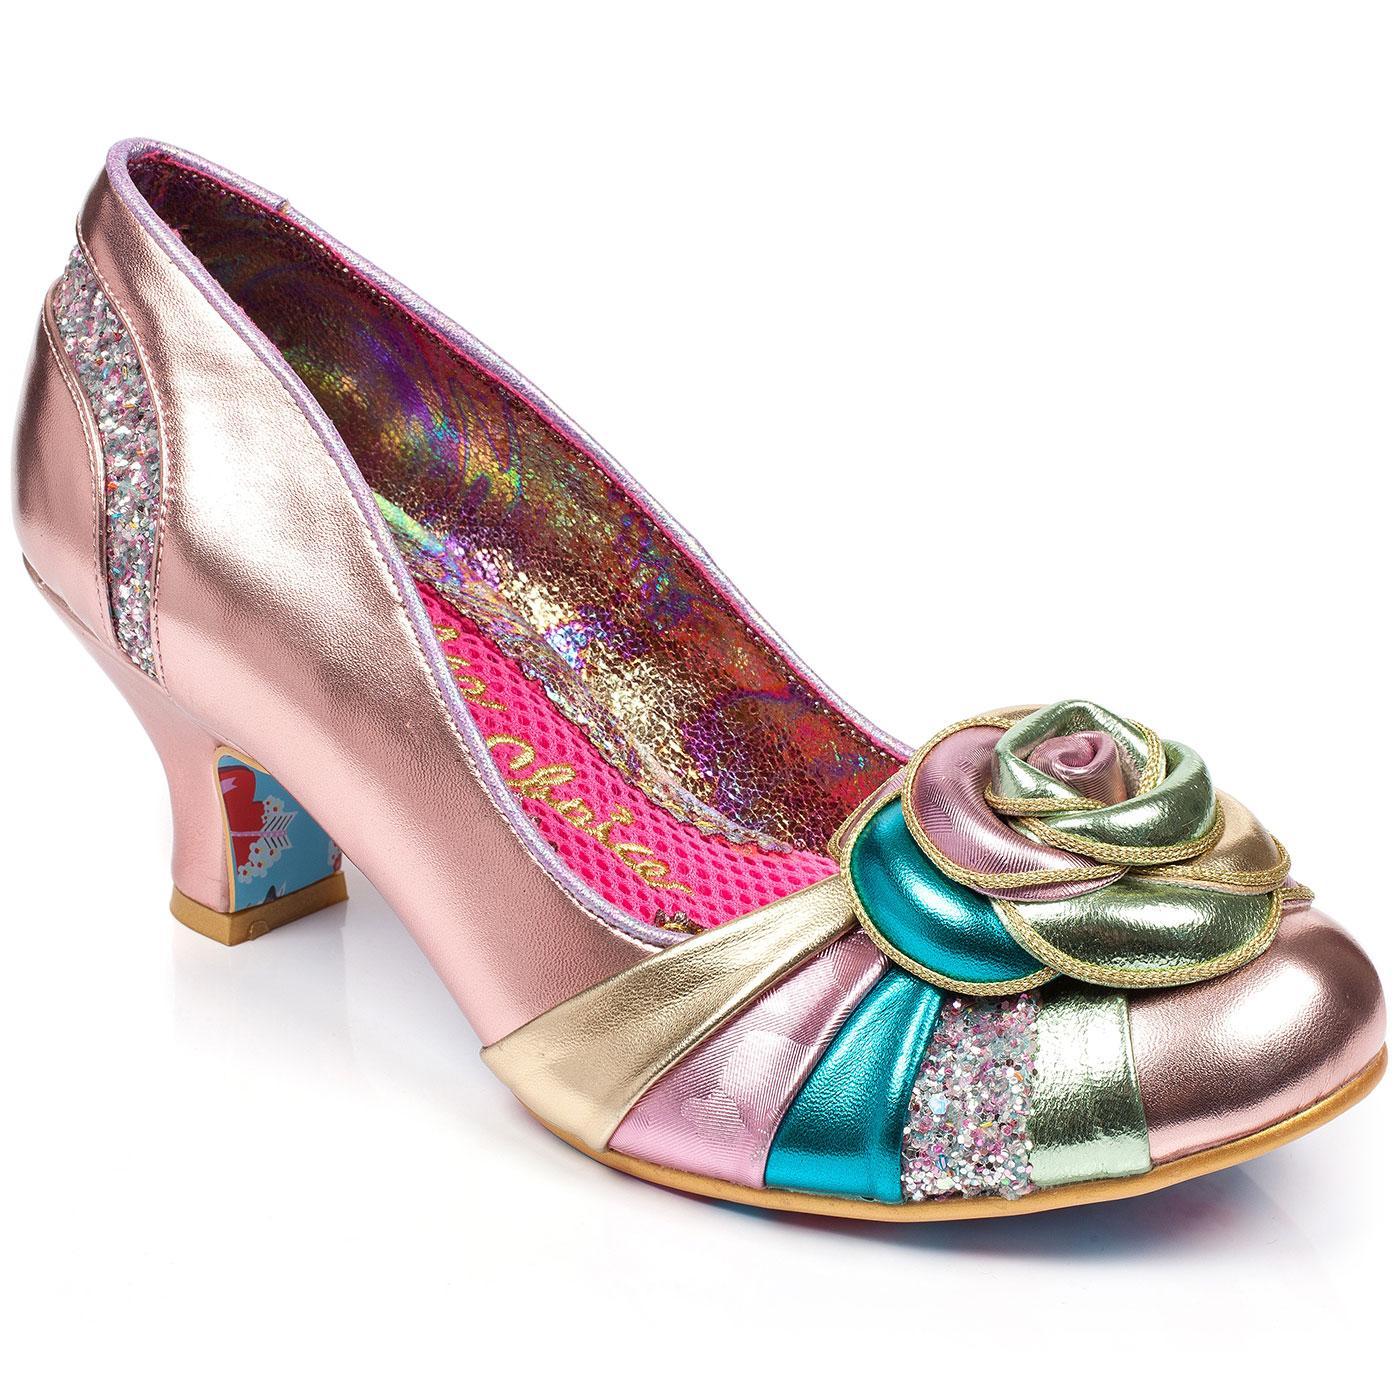 Stupenda IRREGULAR CHOICE Vintage Pastel Rose Heel